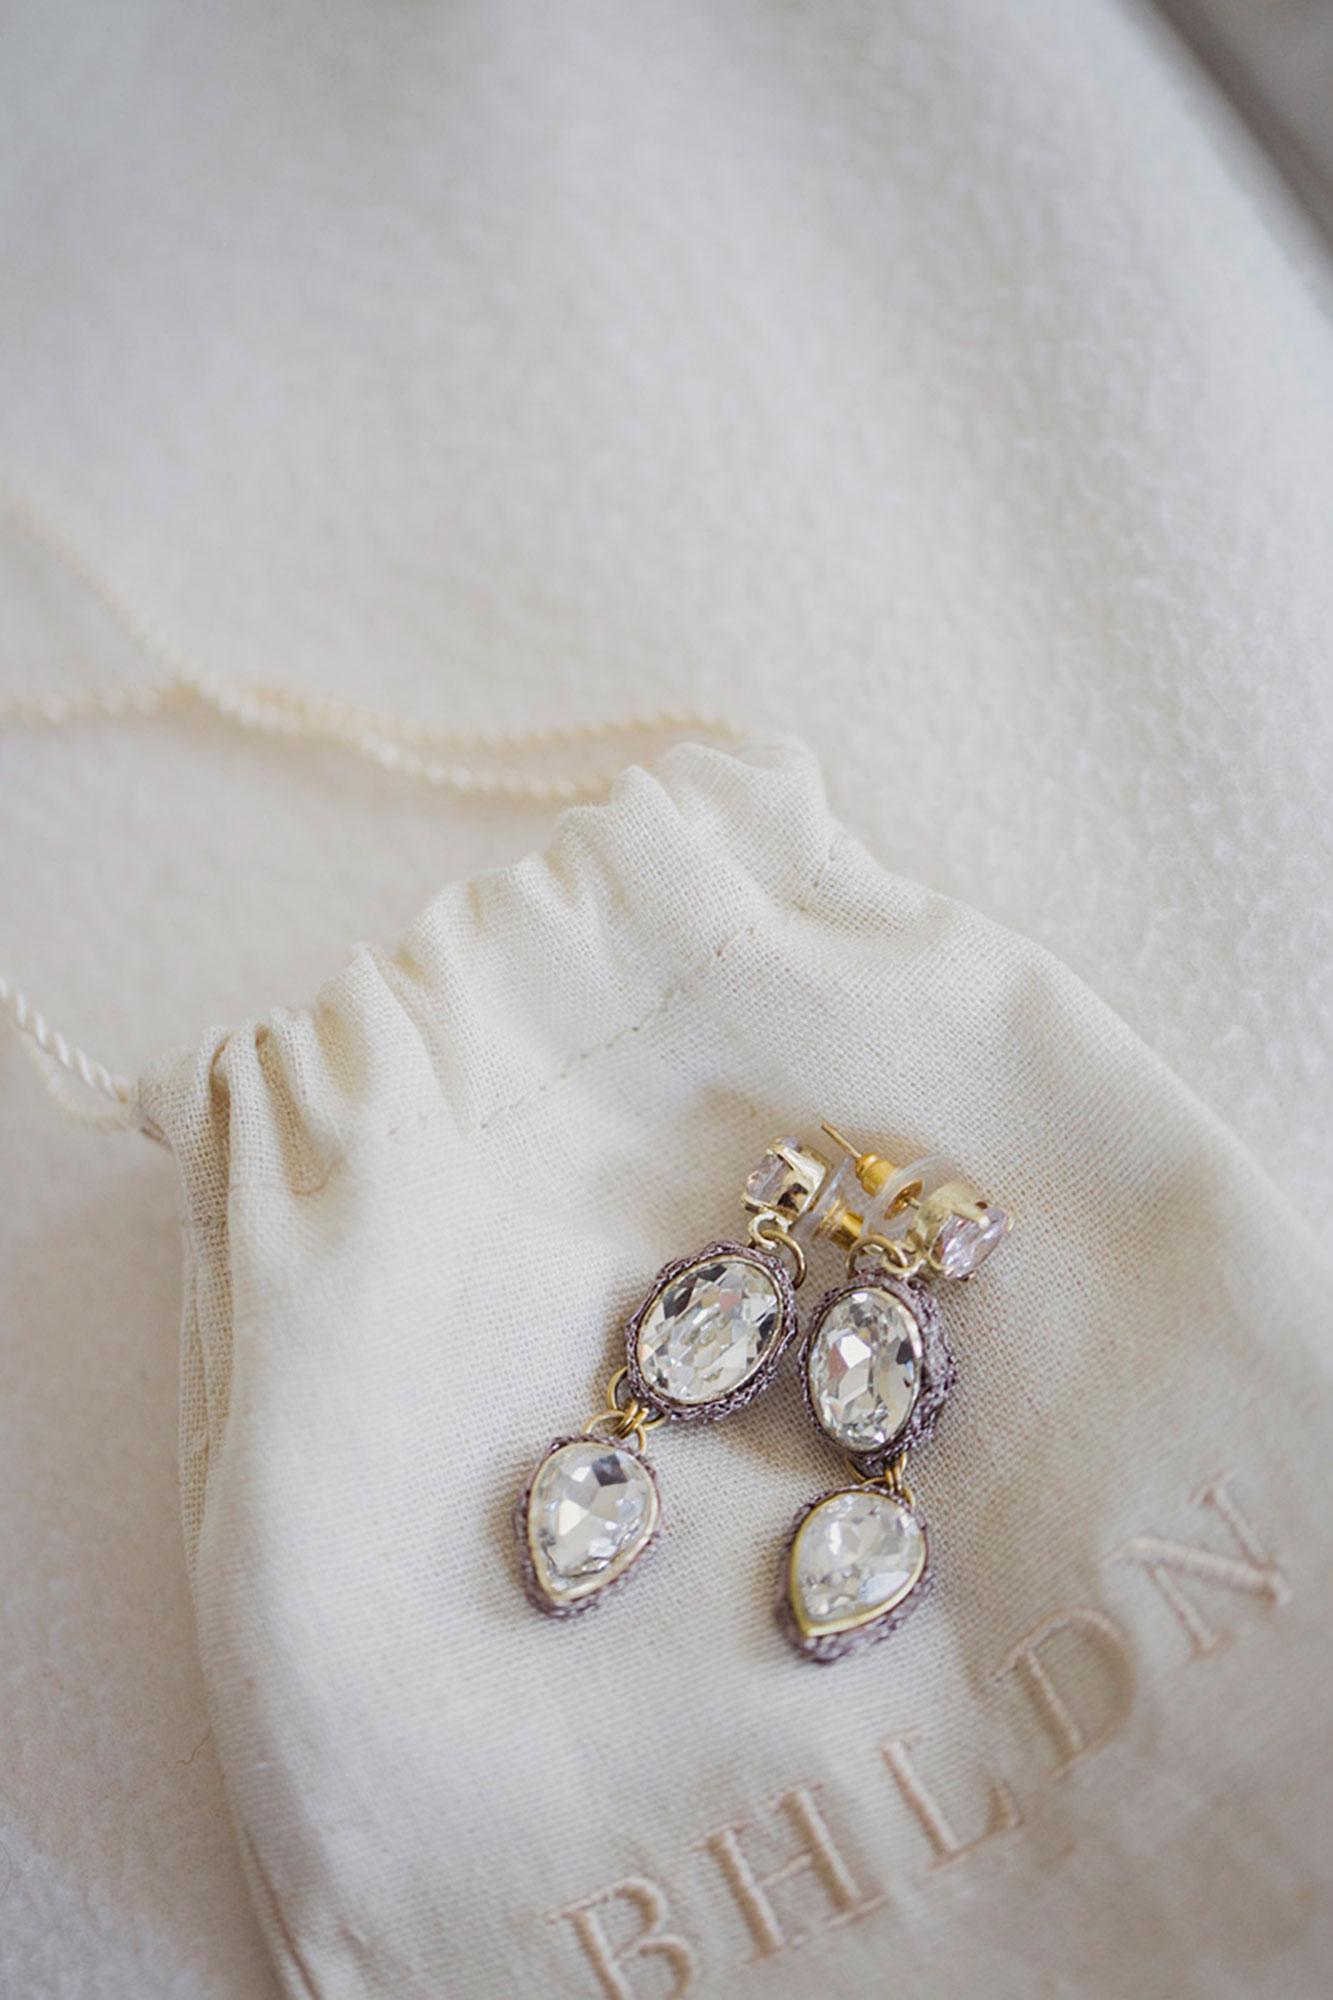 Balls-Falls-Vineyard-Bride-Photo-By-Elizabeth-in-Love-002.jpg